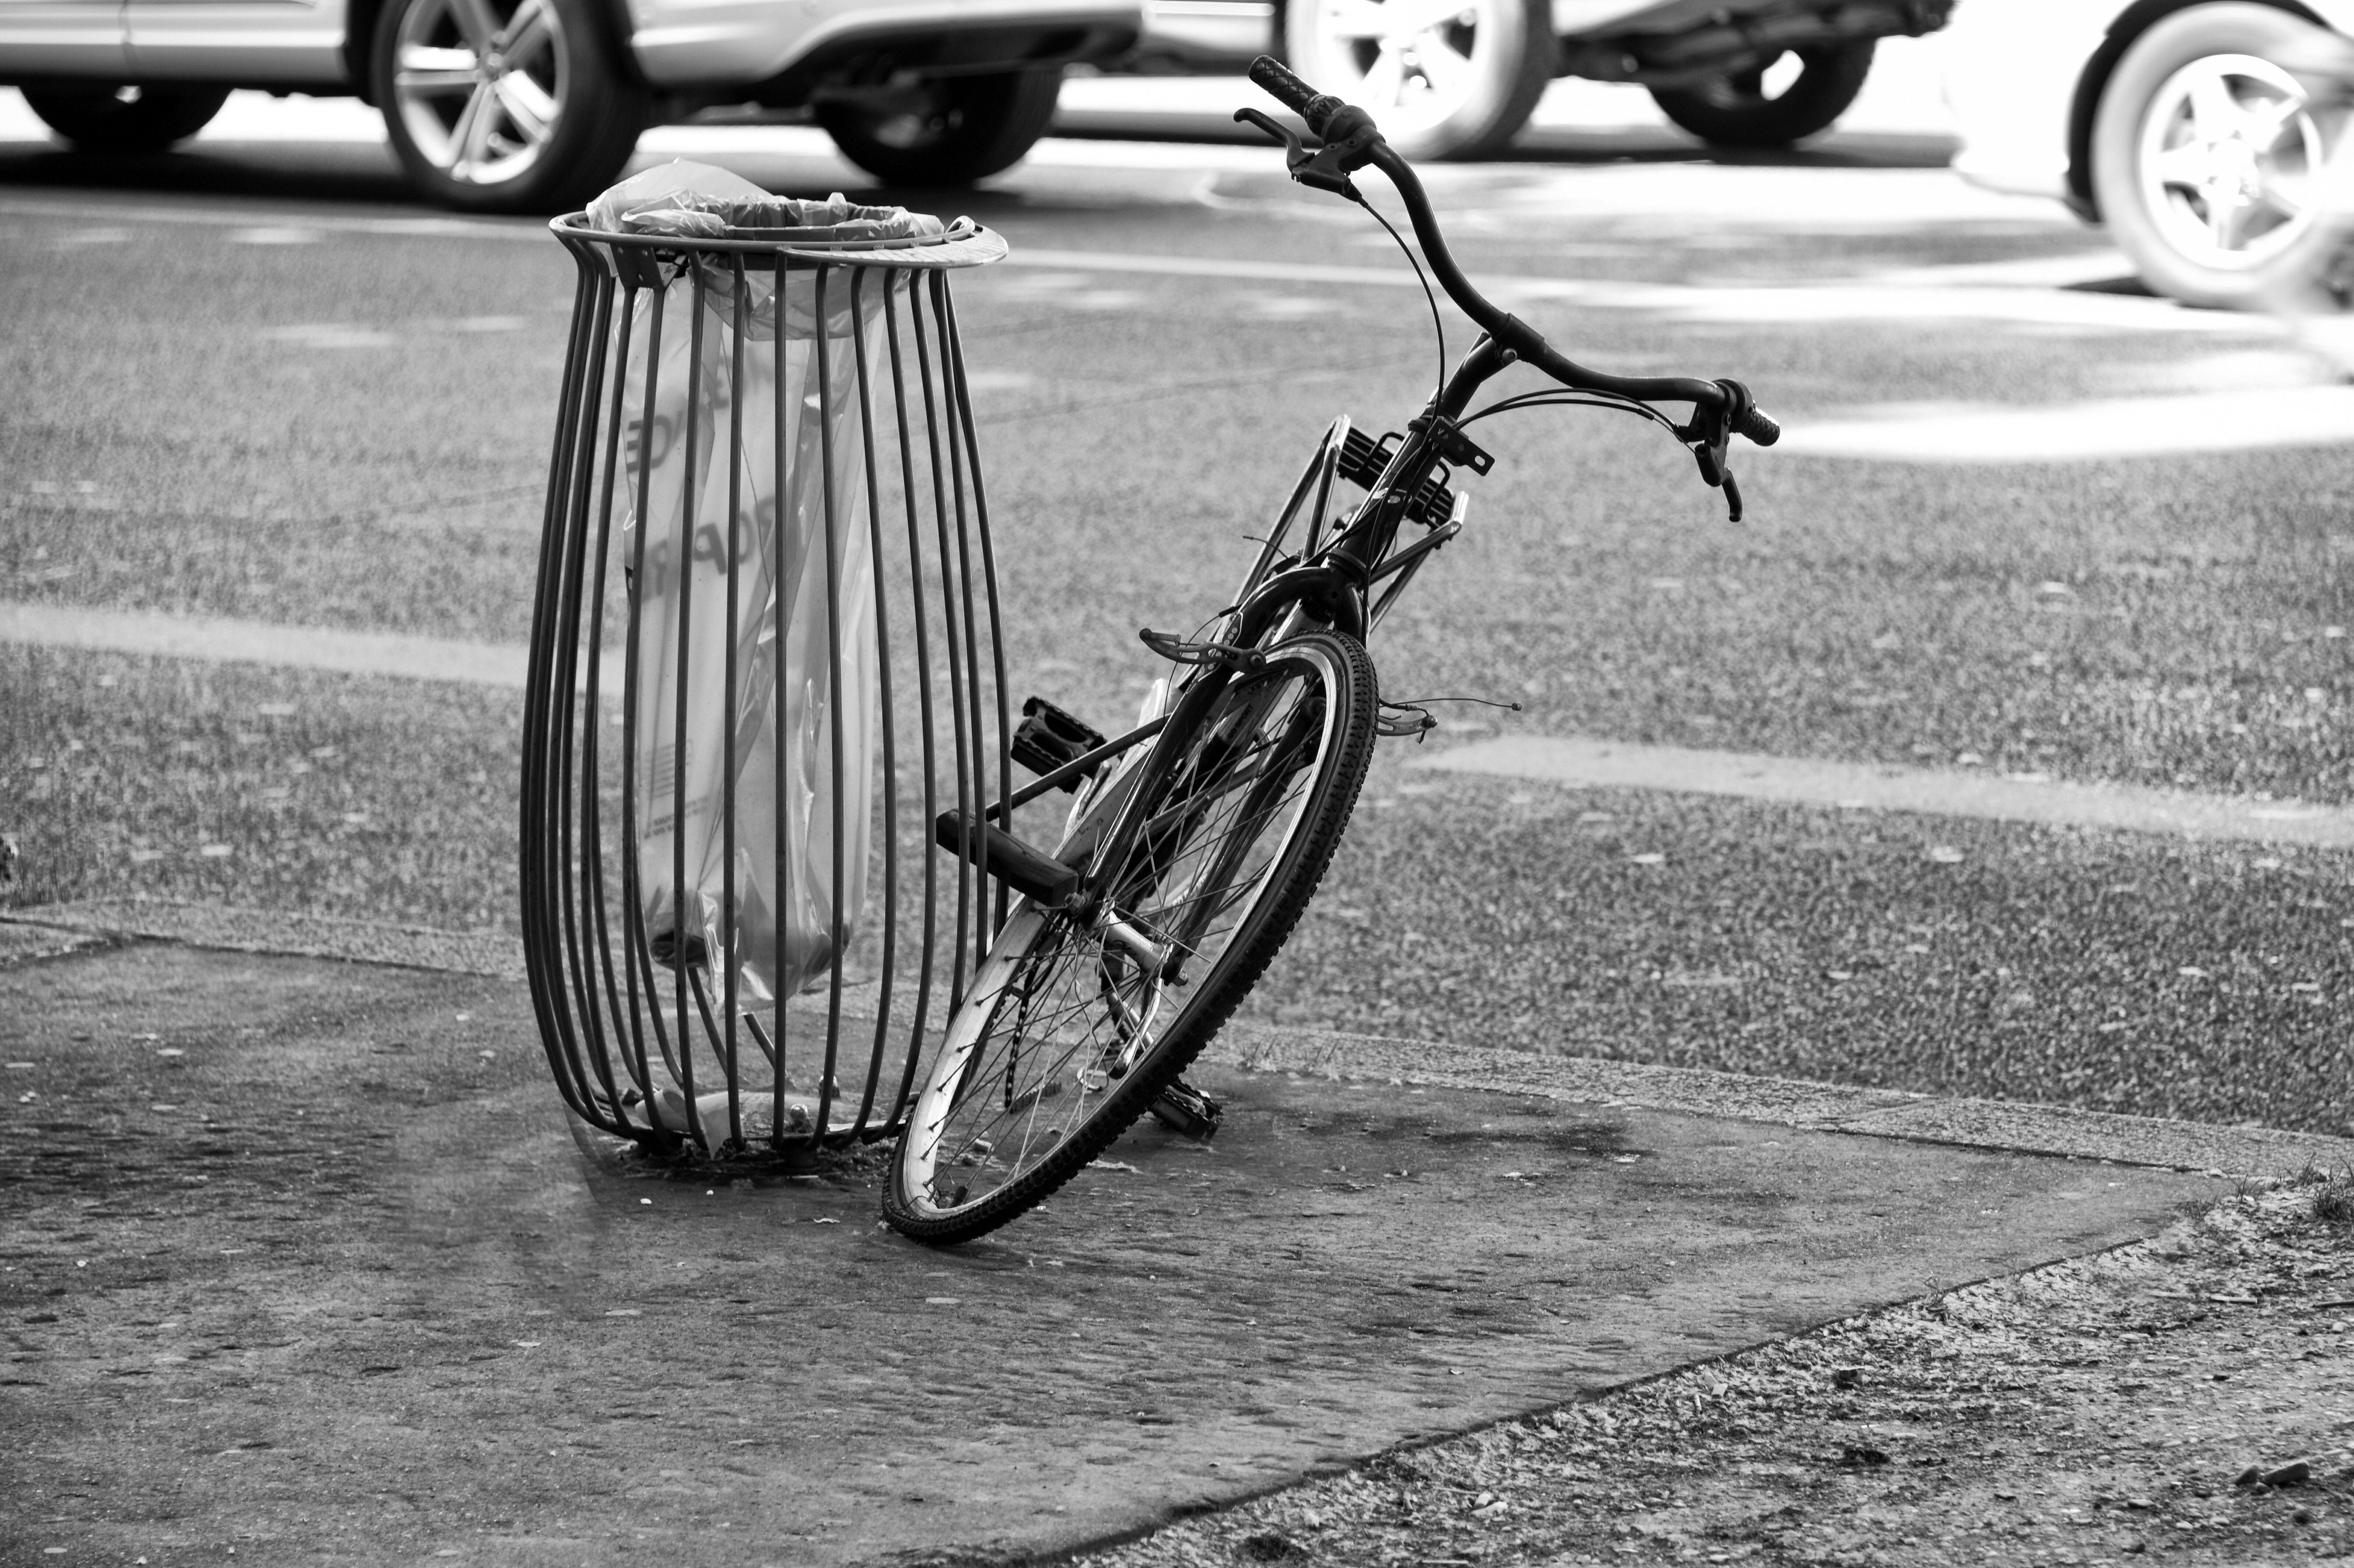 Free images black and white street wheel urban lane sports